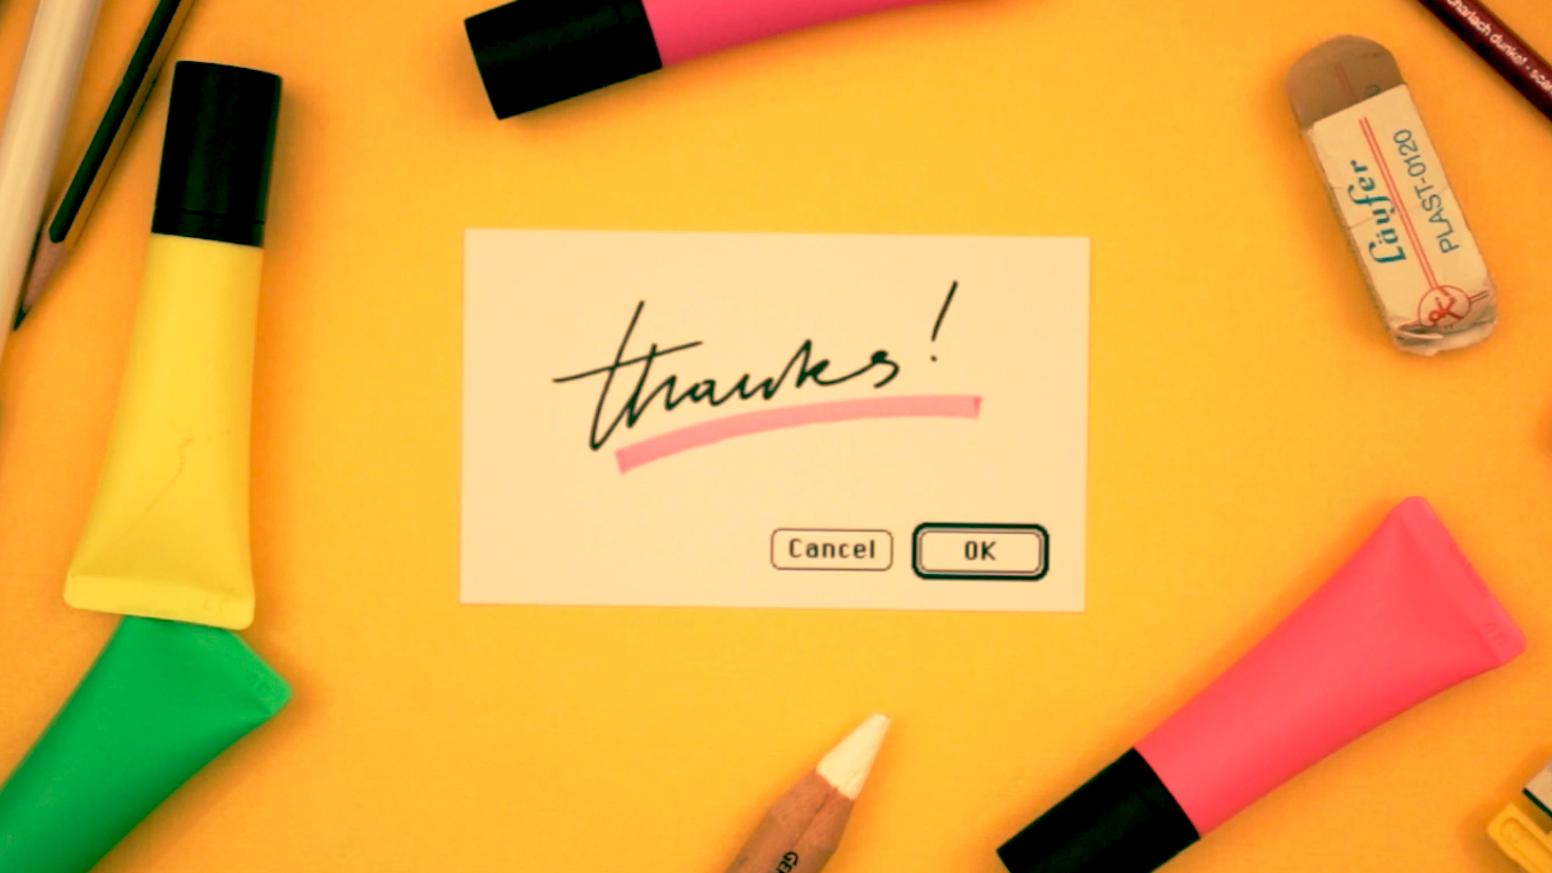 …handwritten Pop-Up-Notifications everywhere!